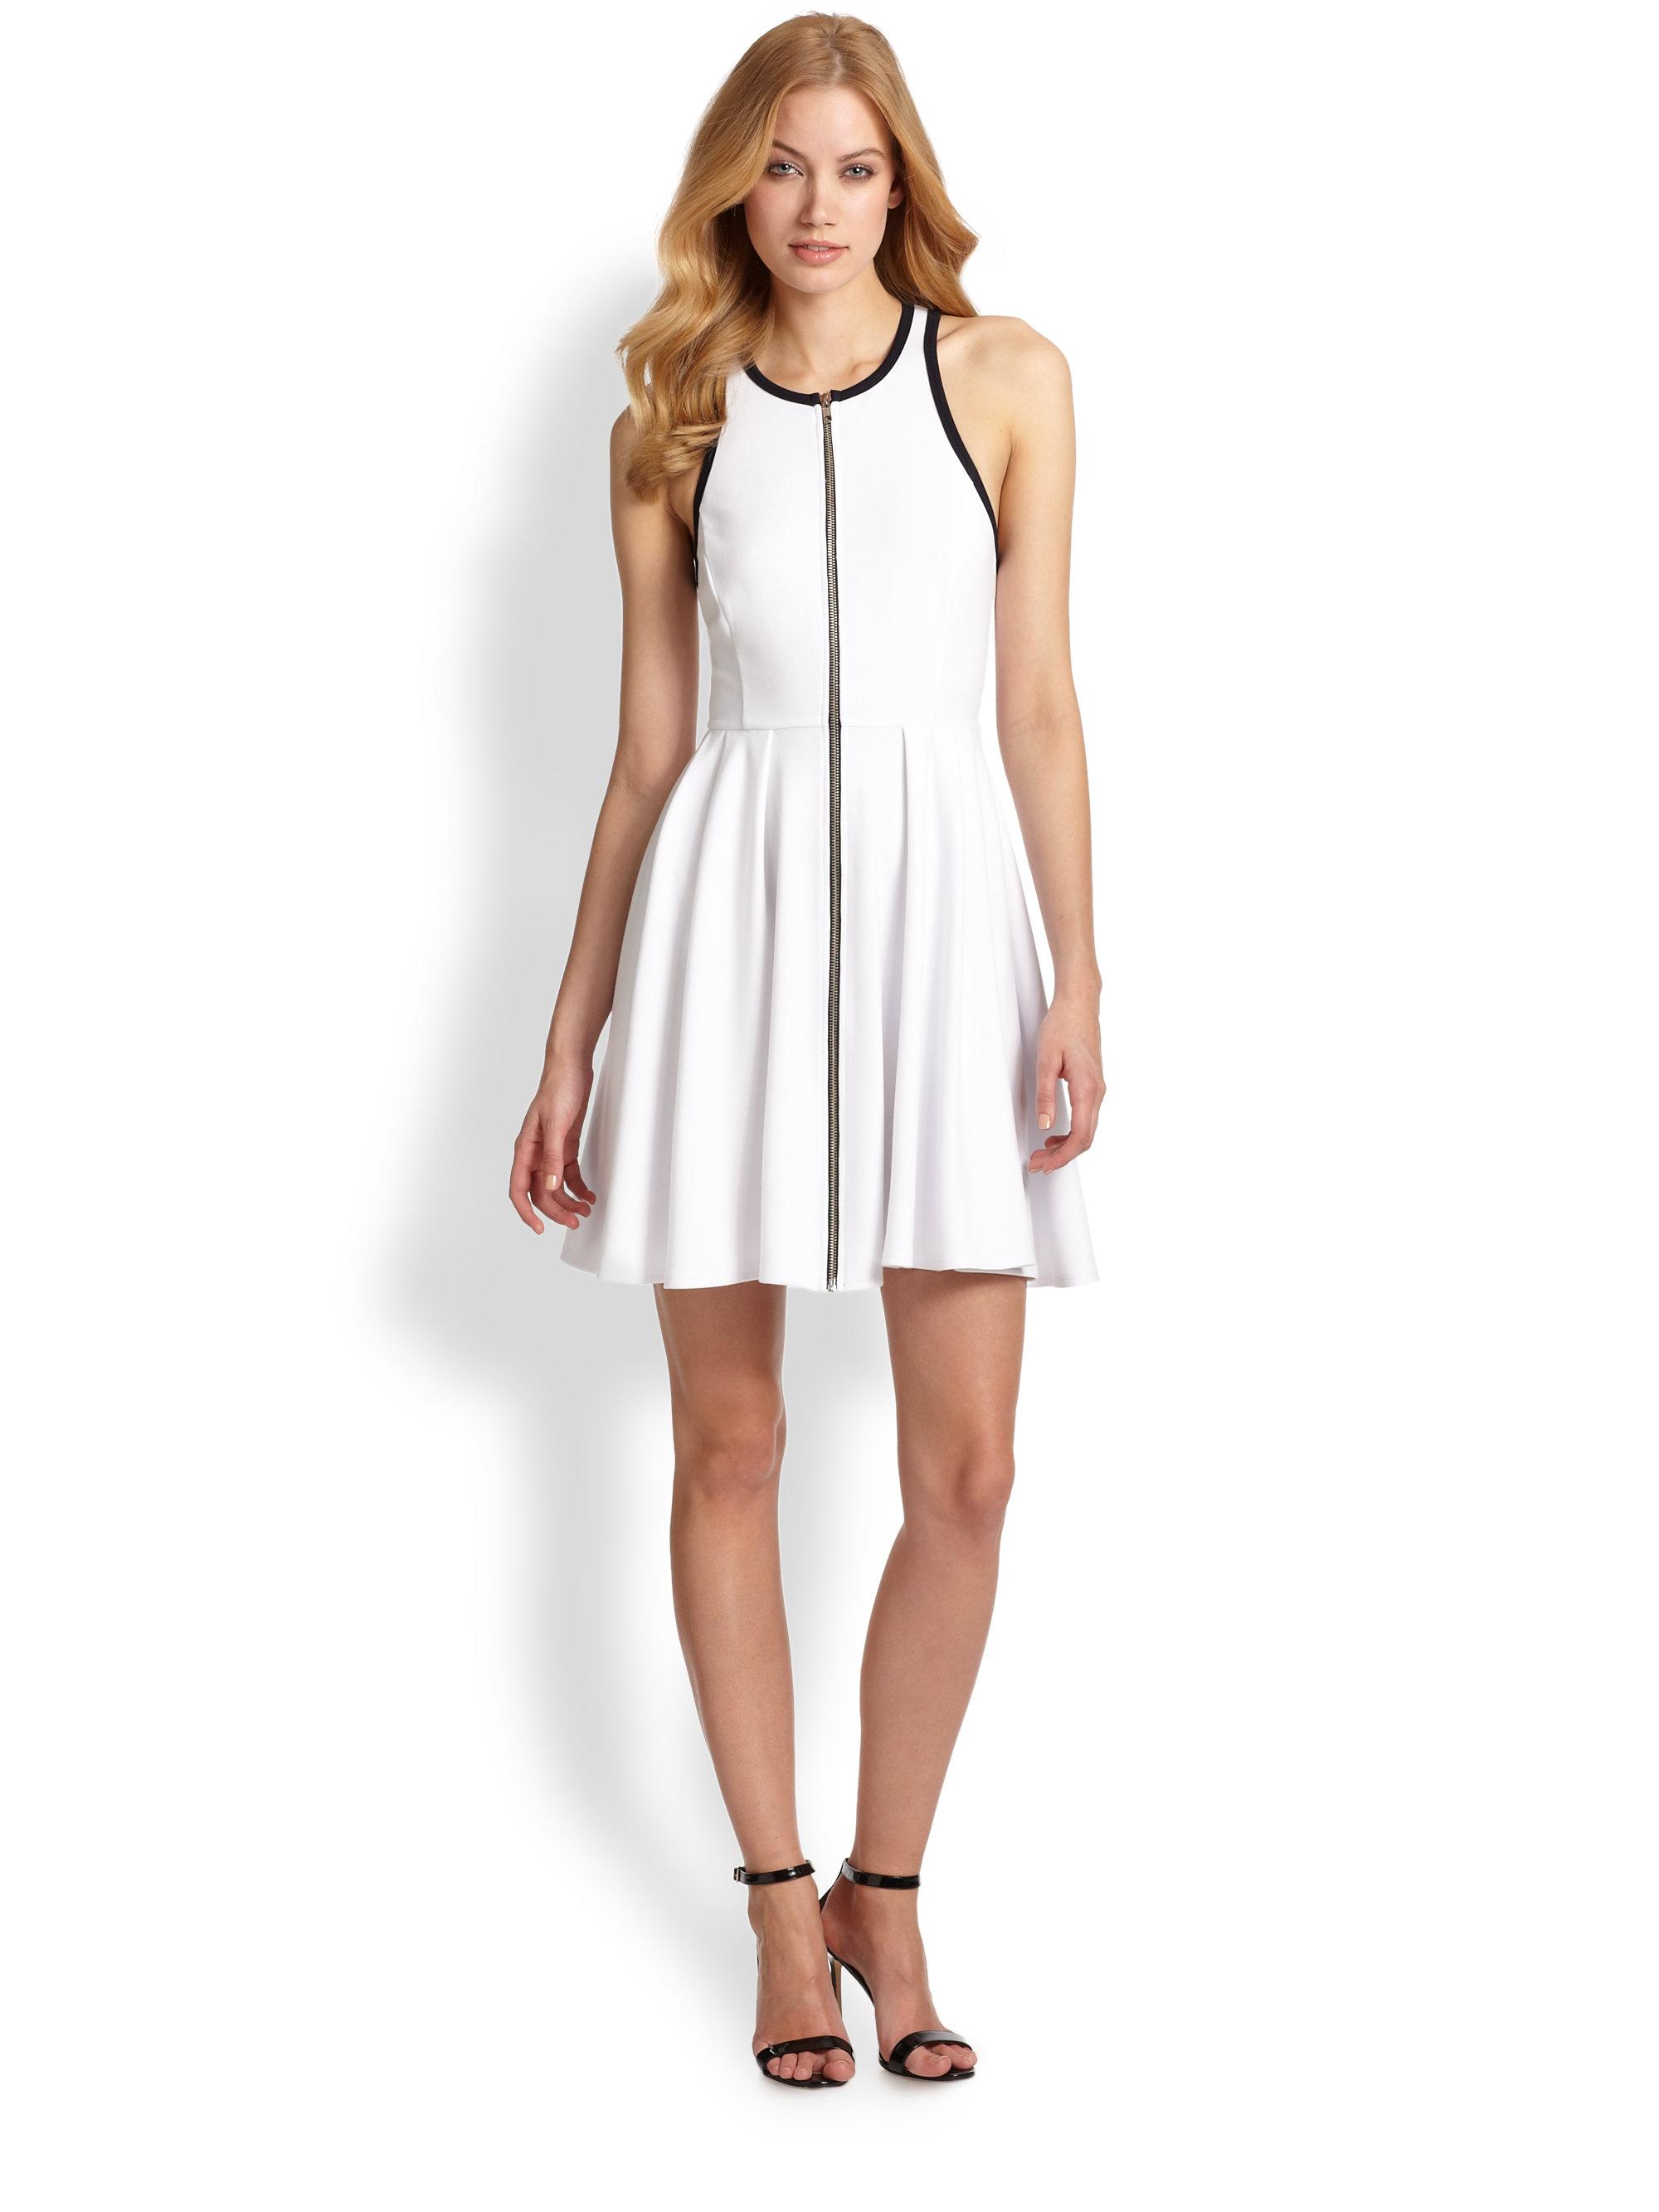 Racerback dress whites